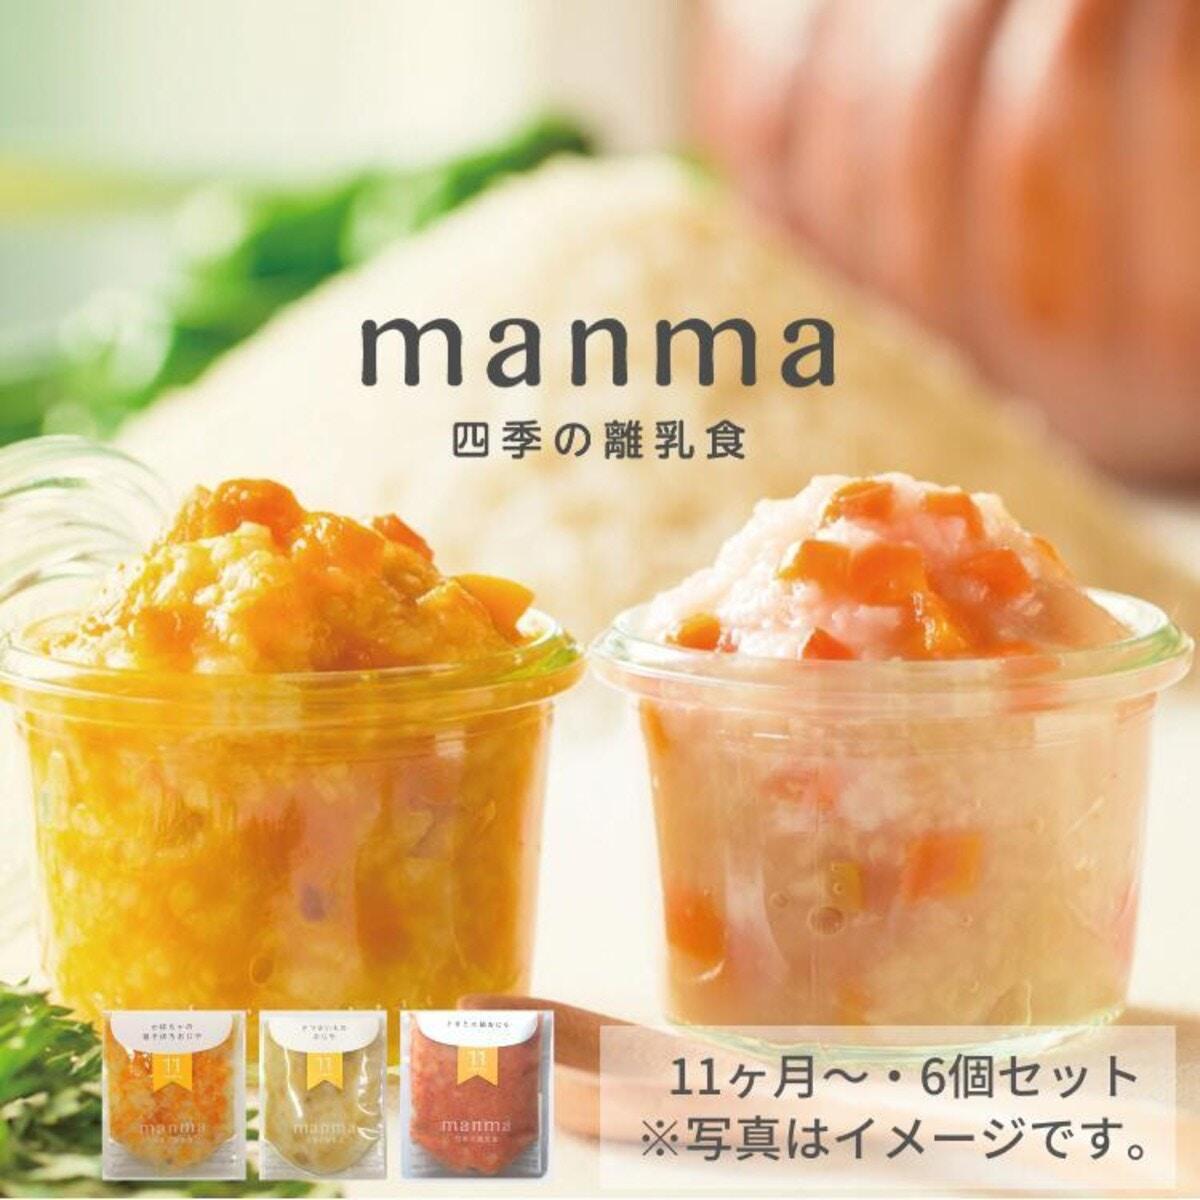 manma 「四季の離乳食 」11か月×6個セット